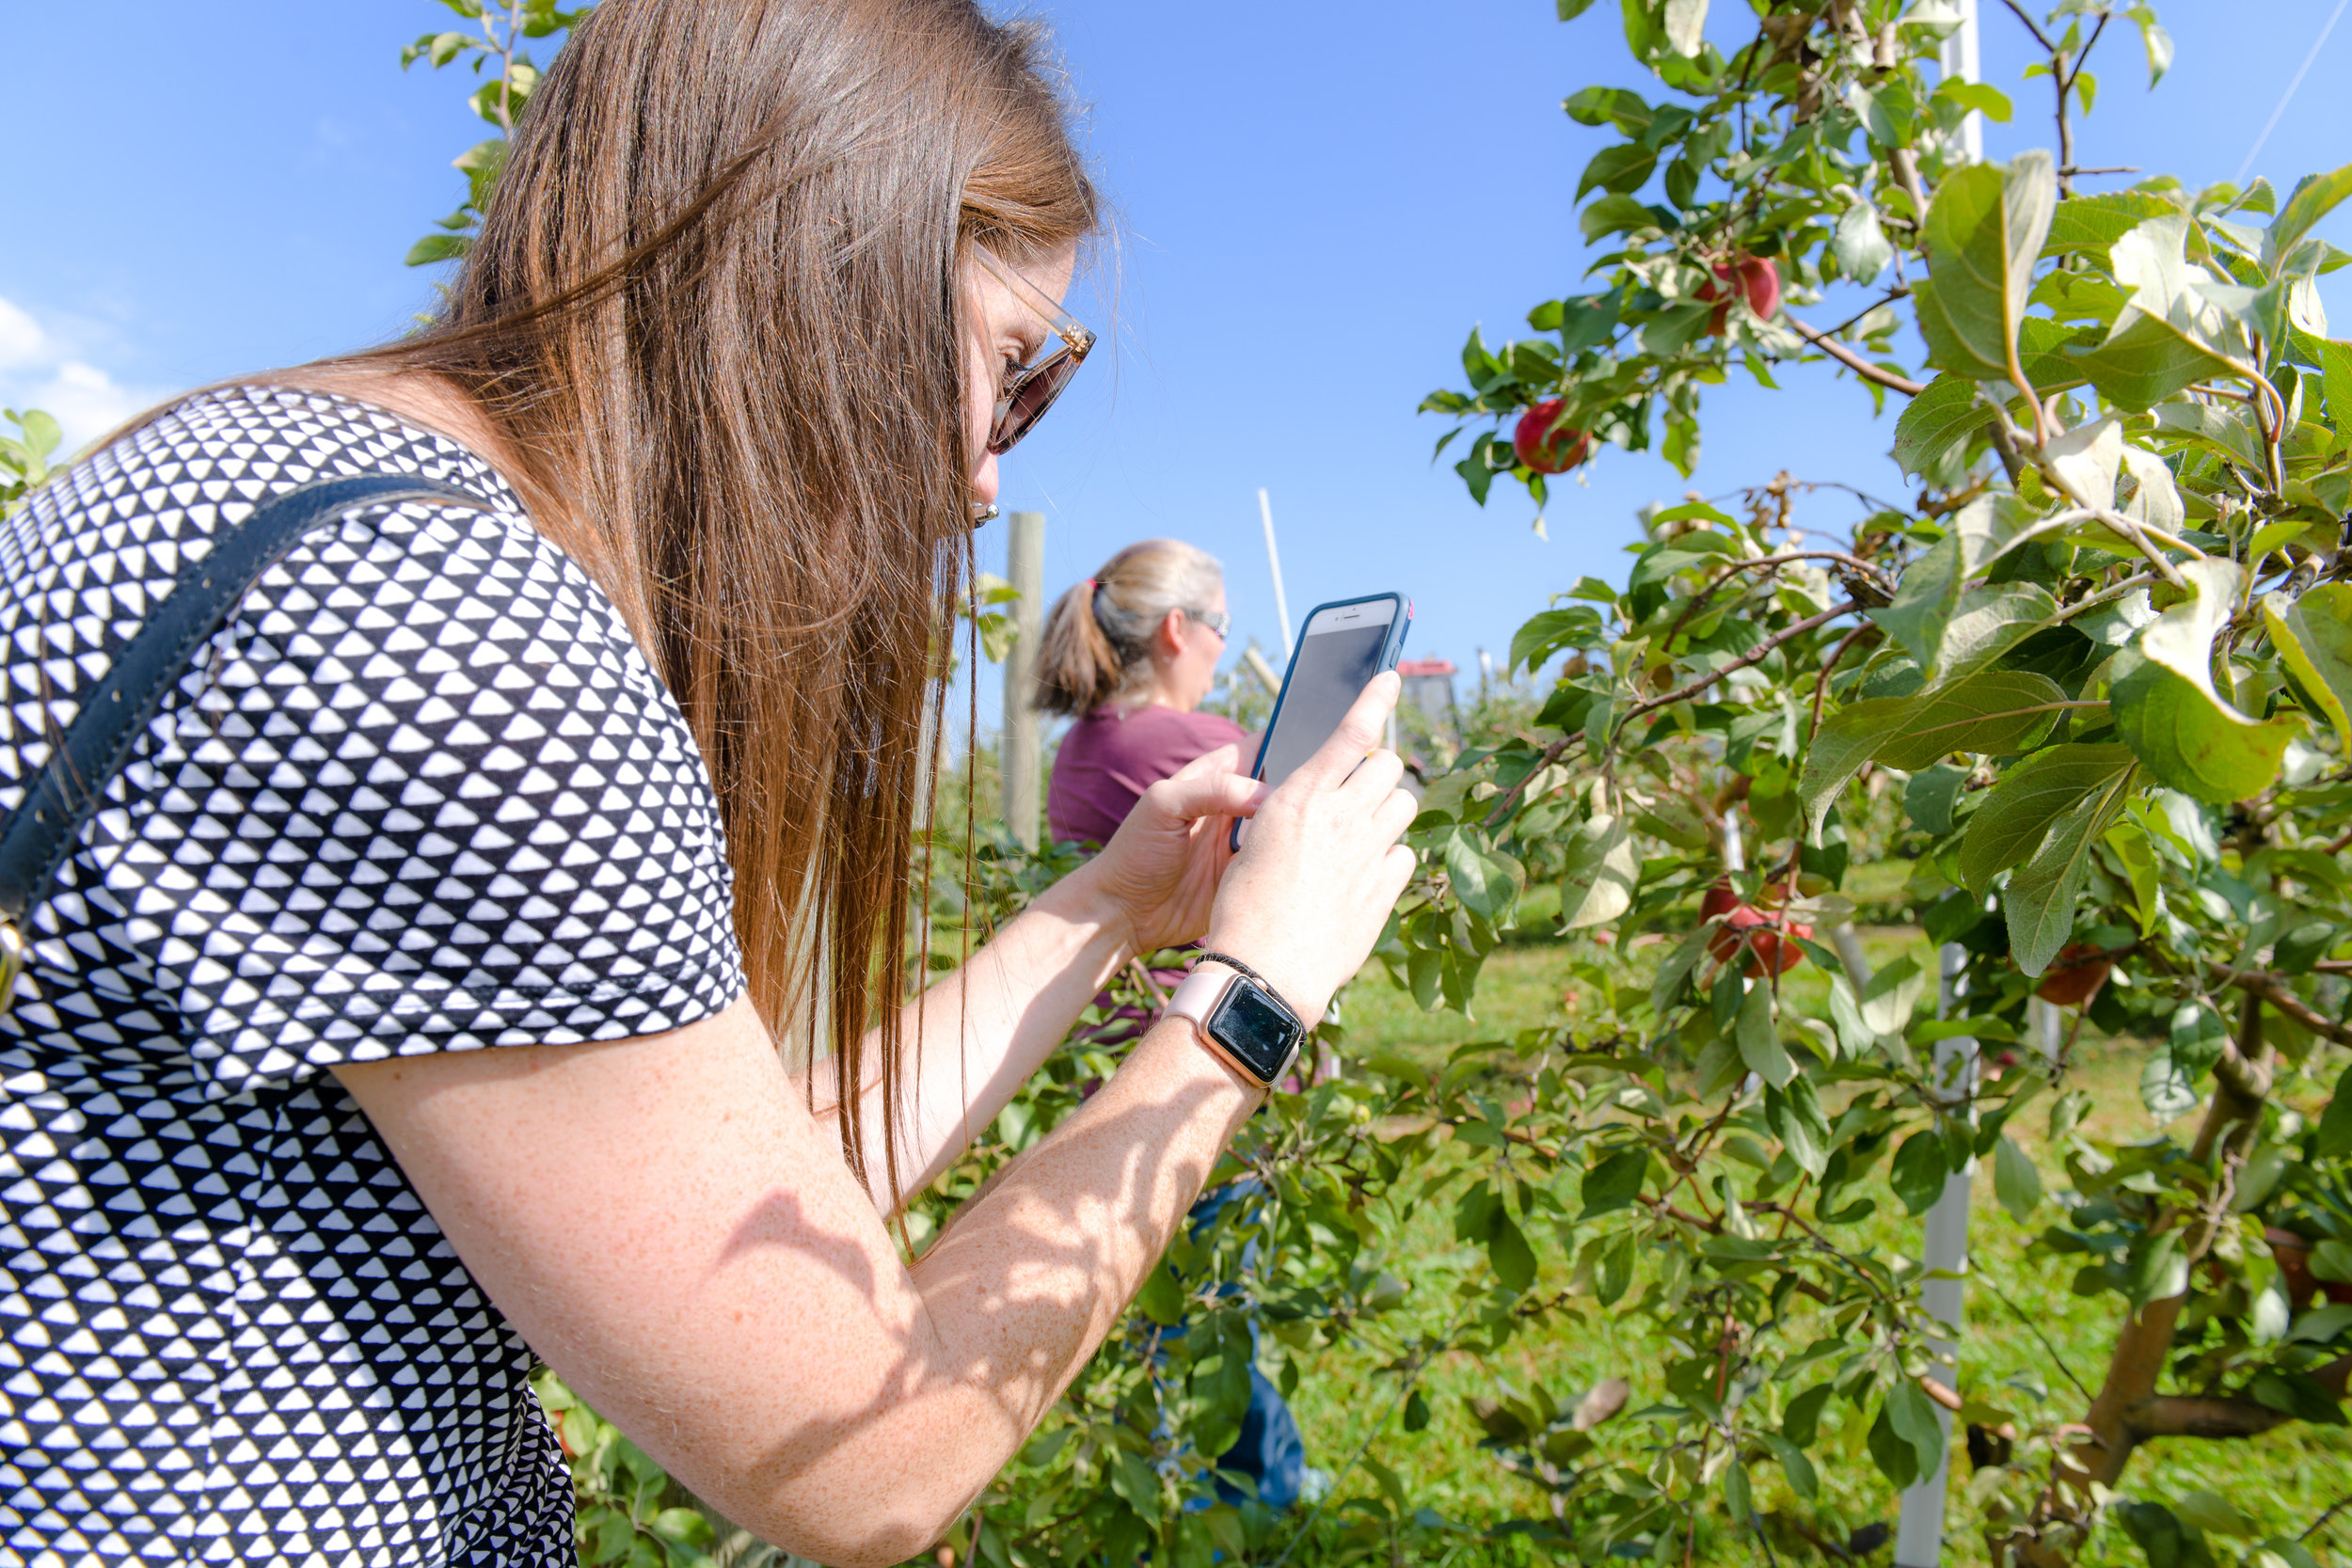 Apples grow on a trellis system to improve efficiencies in production per acre. Photo credit: Joseph L. Murphy/Iowa Soybean Association